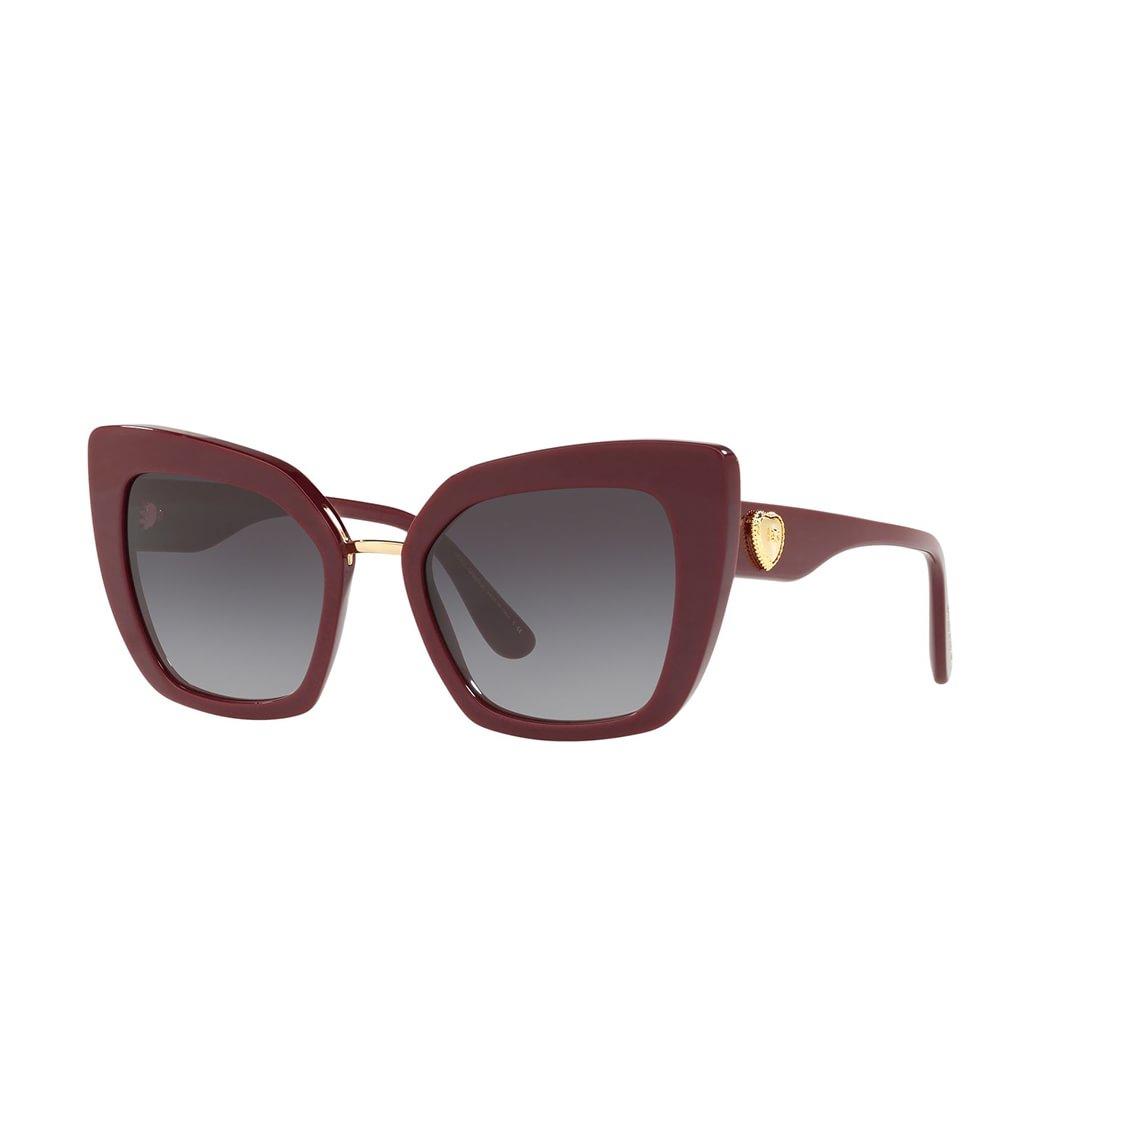 Dolce & Gabbana 0DG4359 52 30918G